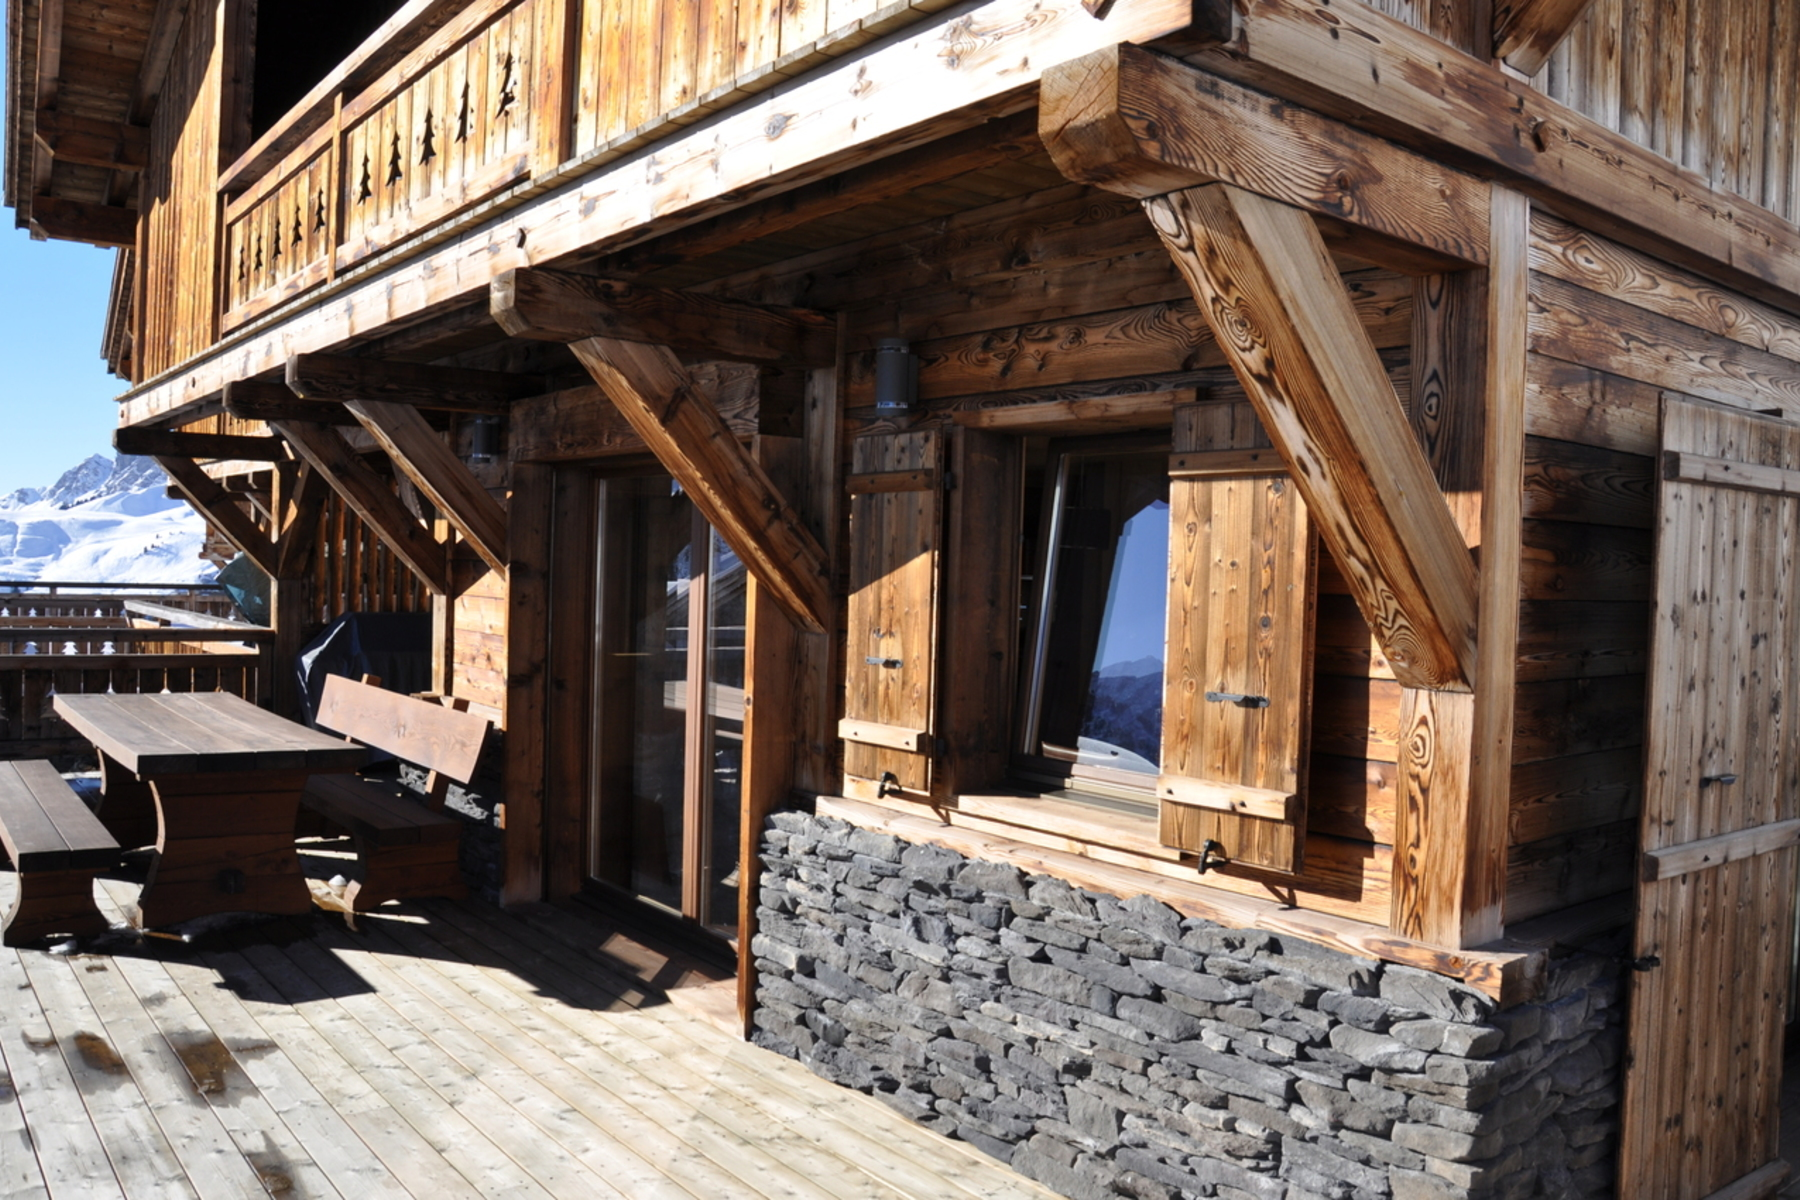 Moradia para Venda às Beautiful chalet at the heart of Les Croset ski resort Les Crosets Les Crosets, Valais, 1873 Suíça